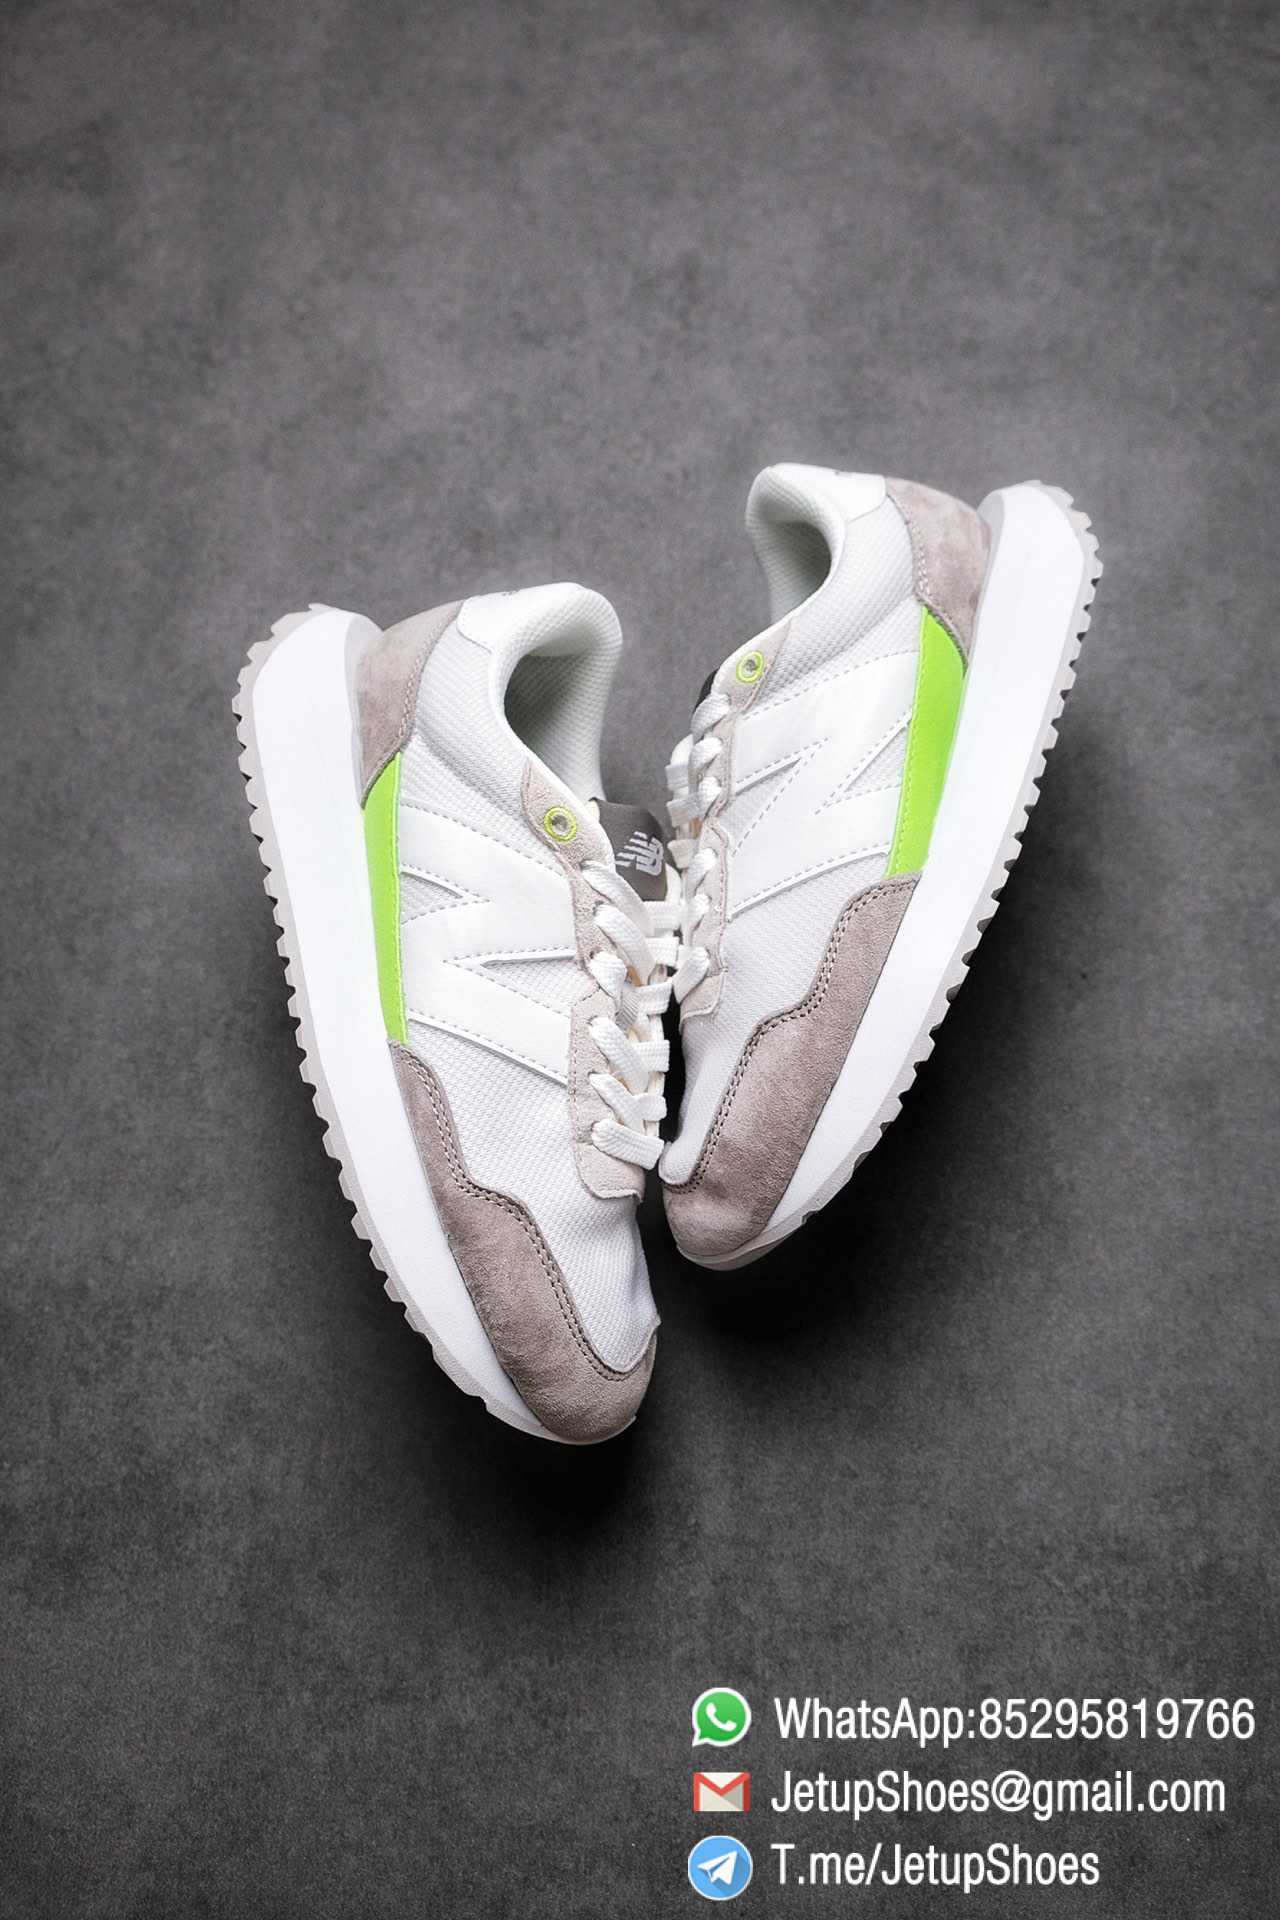 Best Replica New Balance 237 Niko x 237 Grey Green SKU MS237SL1 High Quality Fake Sneakers 03